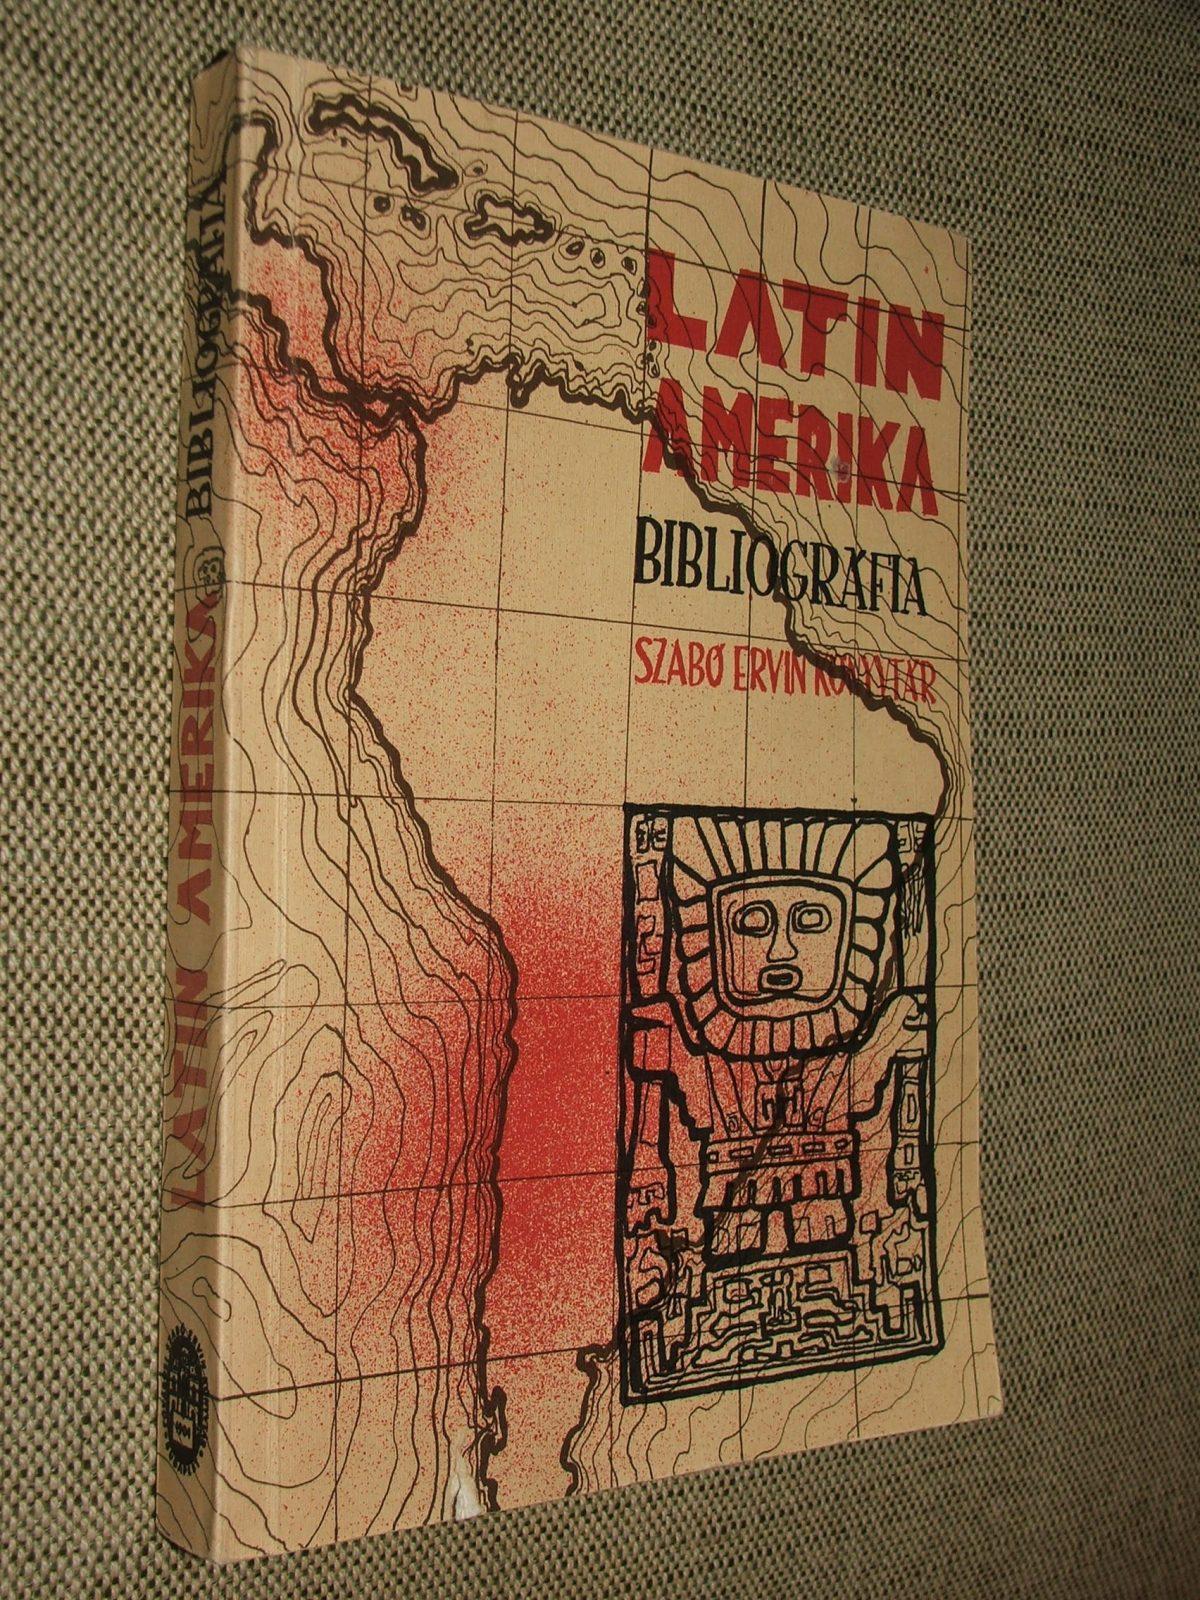 REGULI Ernő: Latin-Amerika bibliográfia